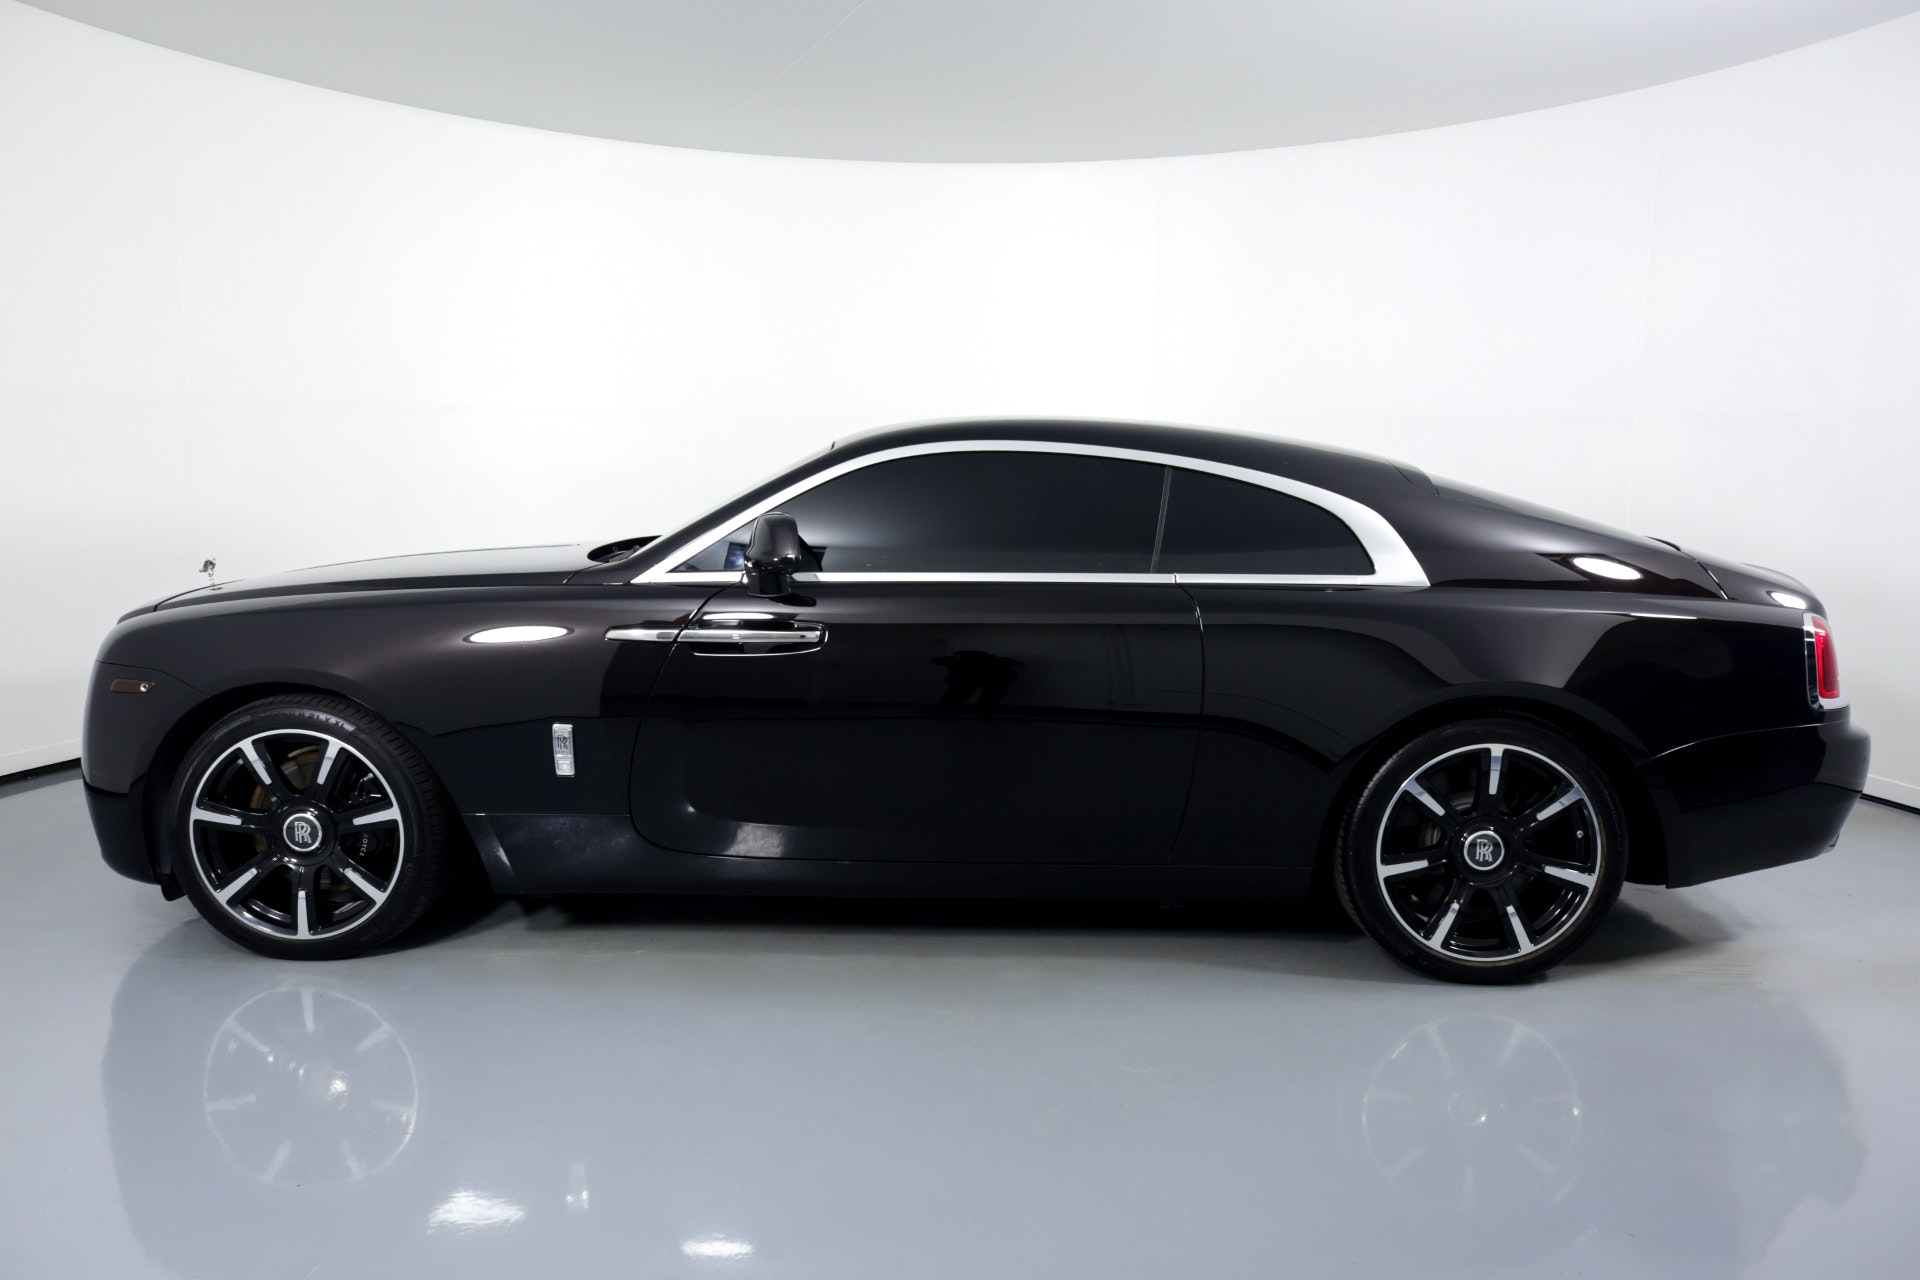 Miami Rolls Royce Wraith image #1